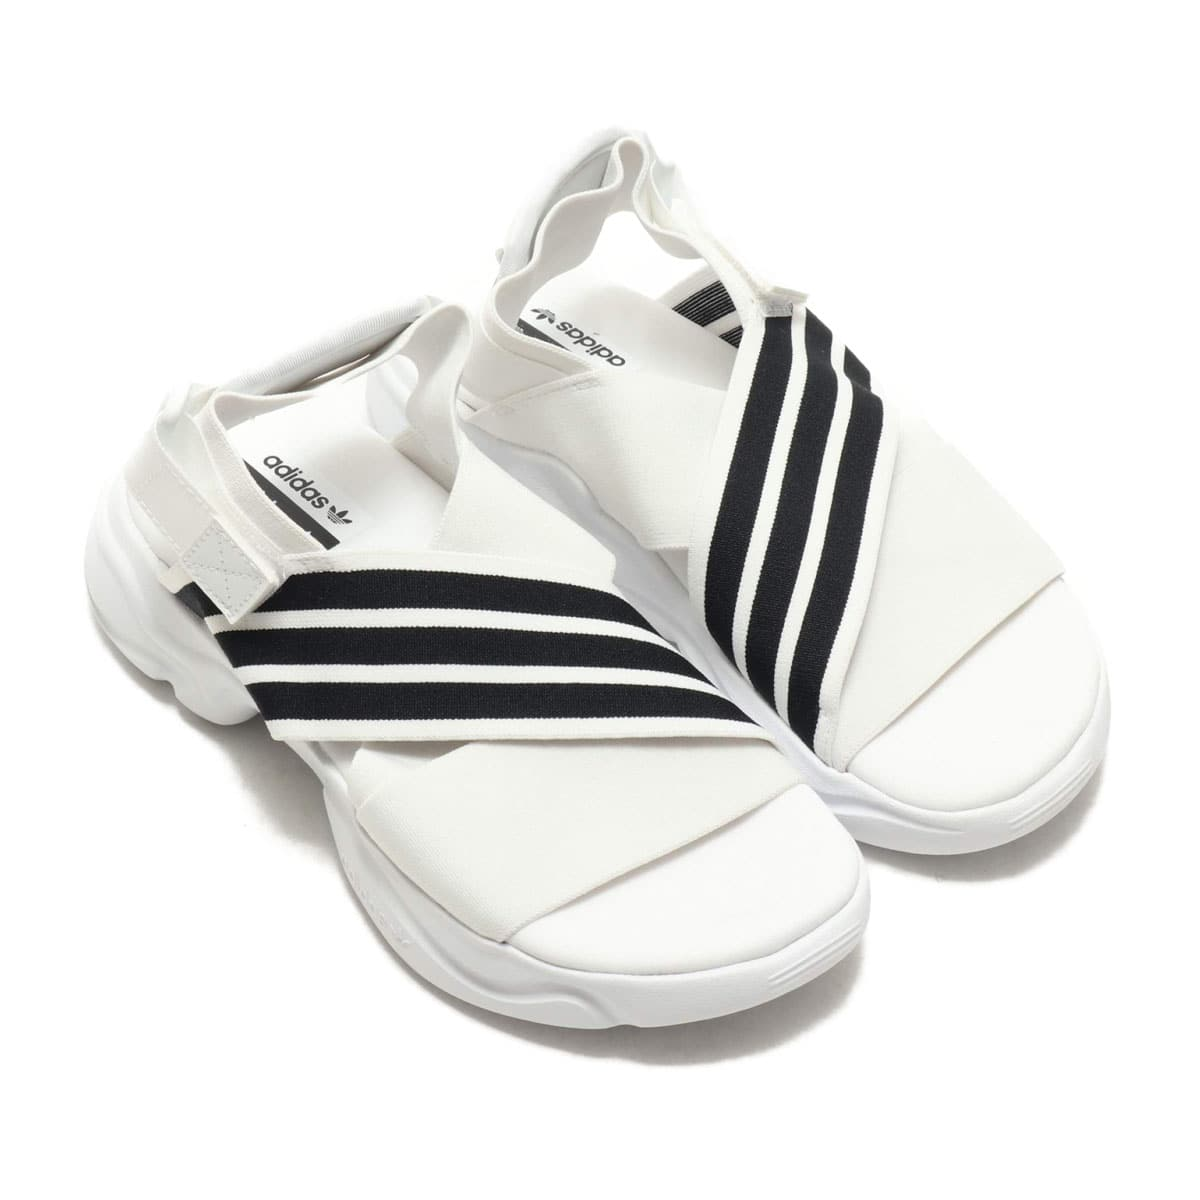 adidas MAGMUR SANDAL W FOOTWEAR WHITE/CORE BLACK/FOOTWEAR WHITE 20SS-I_photo_large